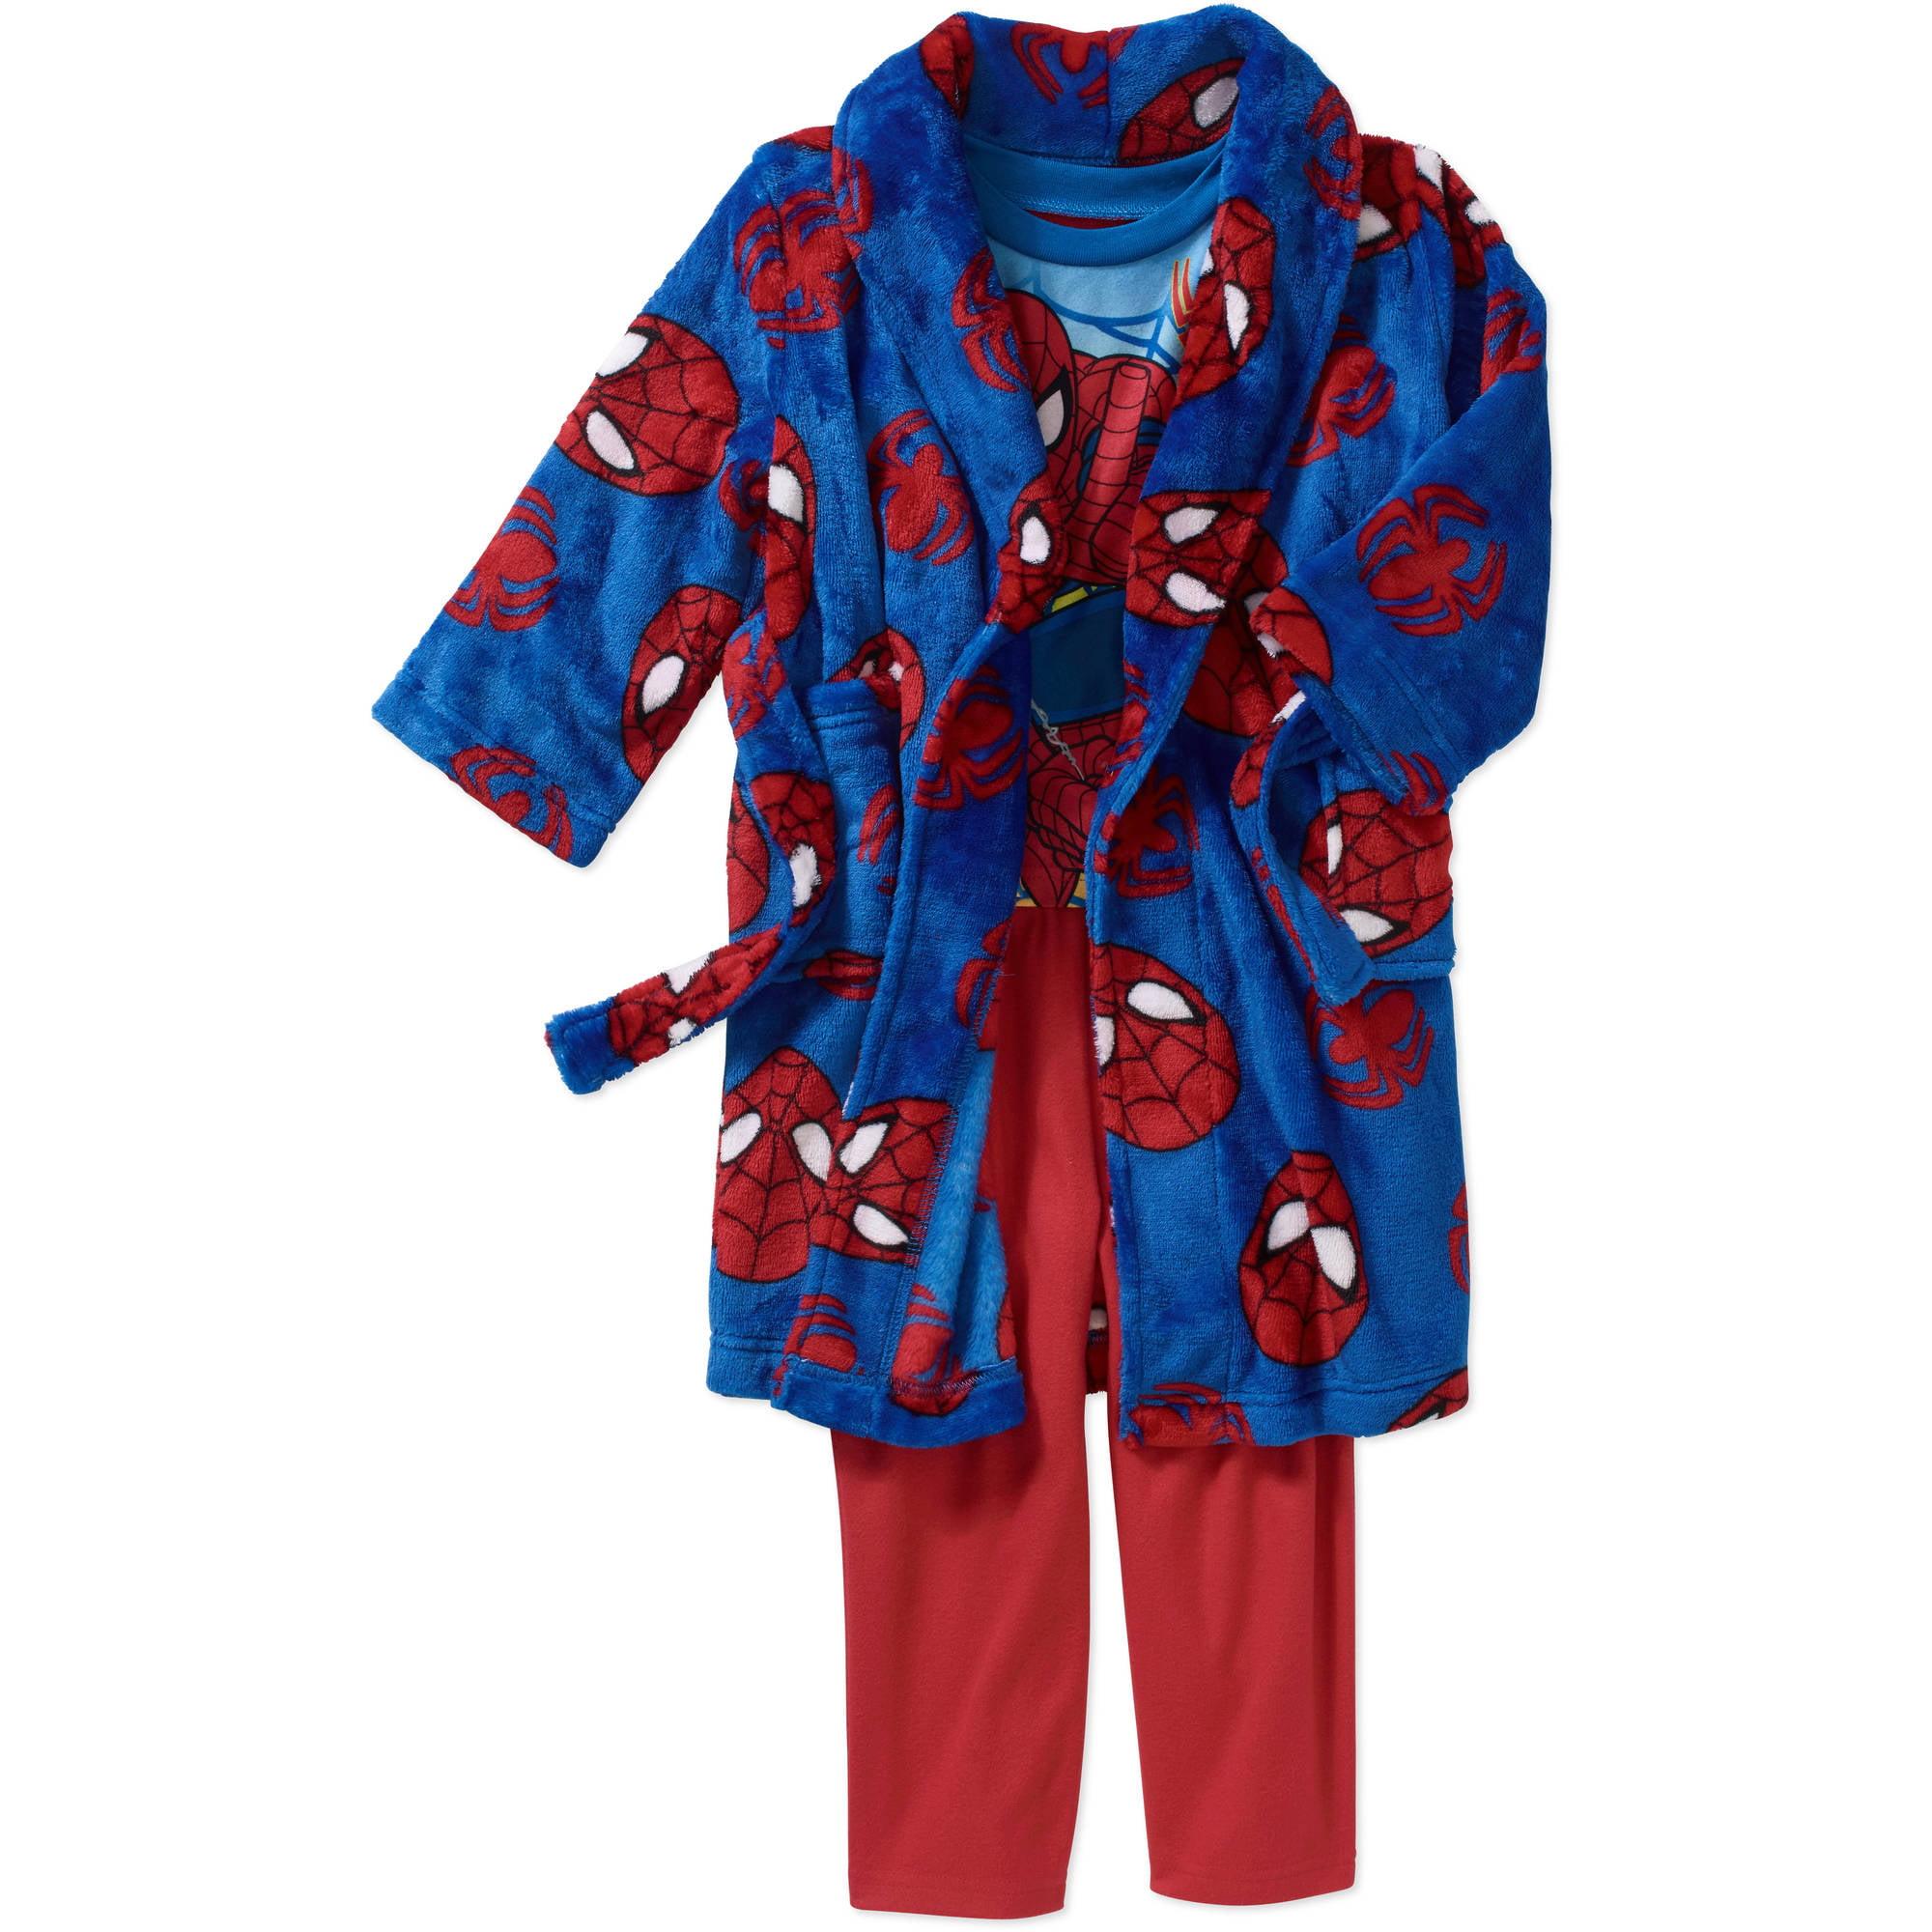 Spiderman Toddler Boy Robe and Pajama 3-Piece Sleepwear Gift Set